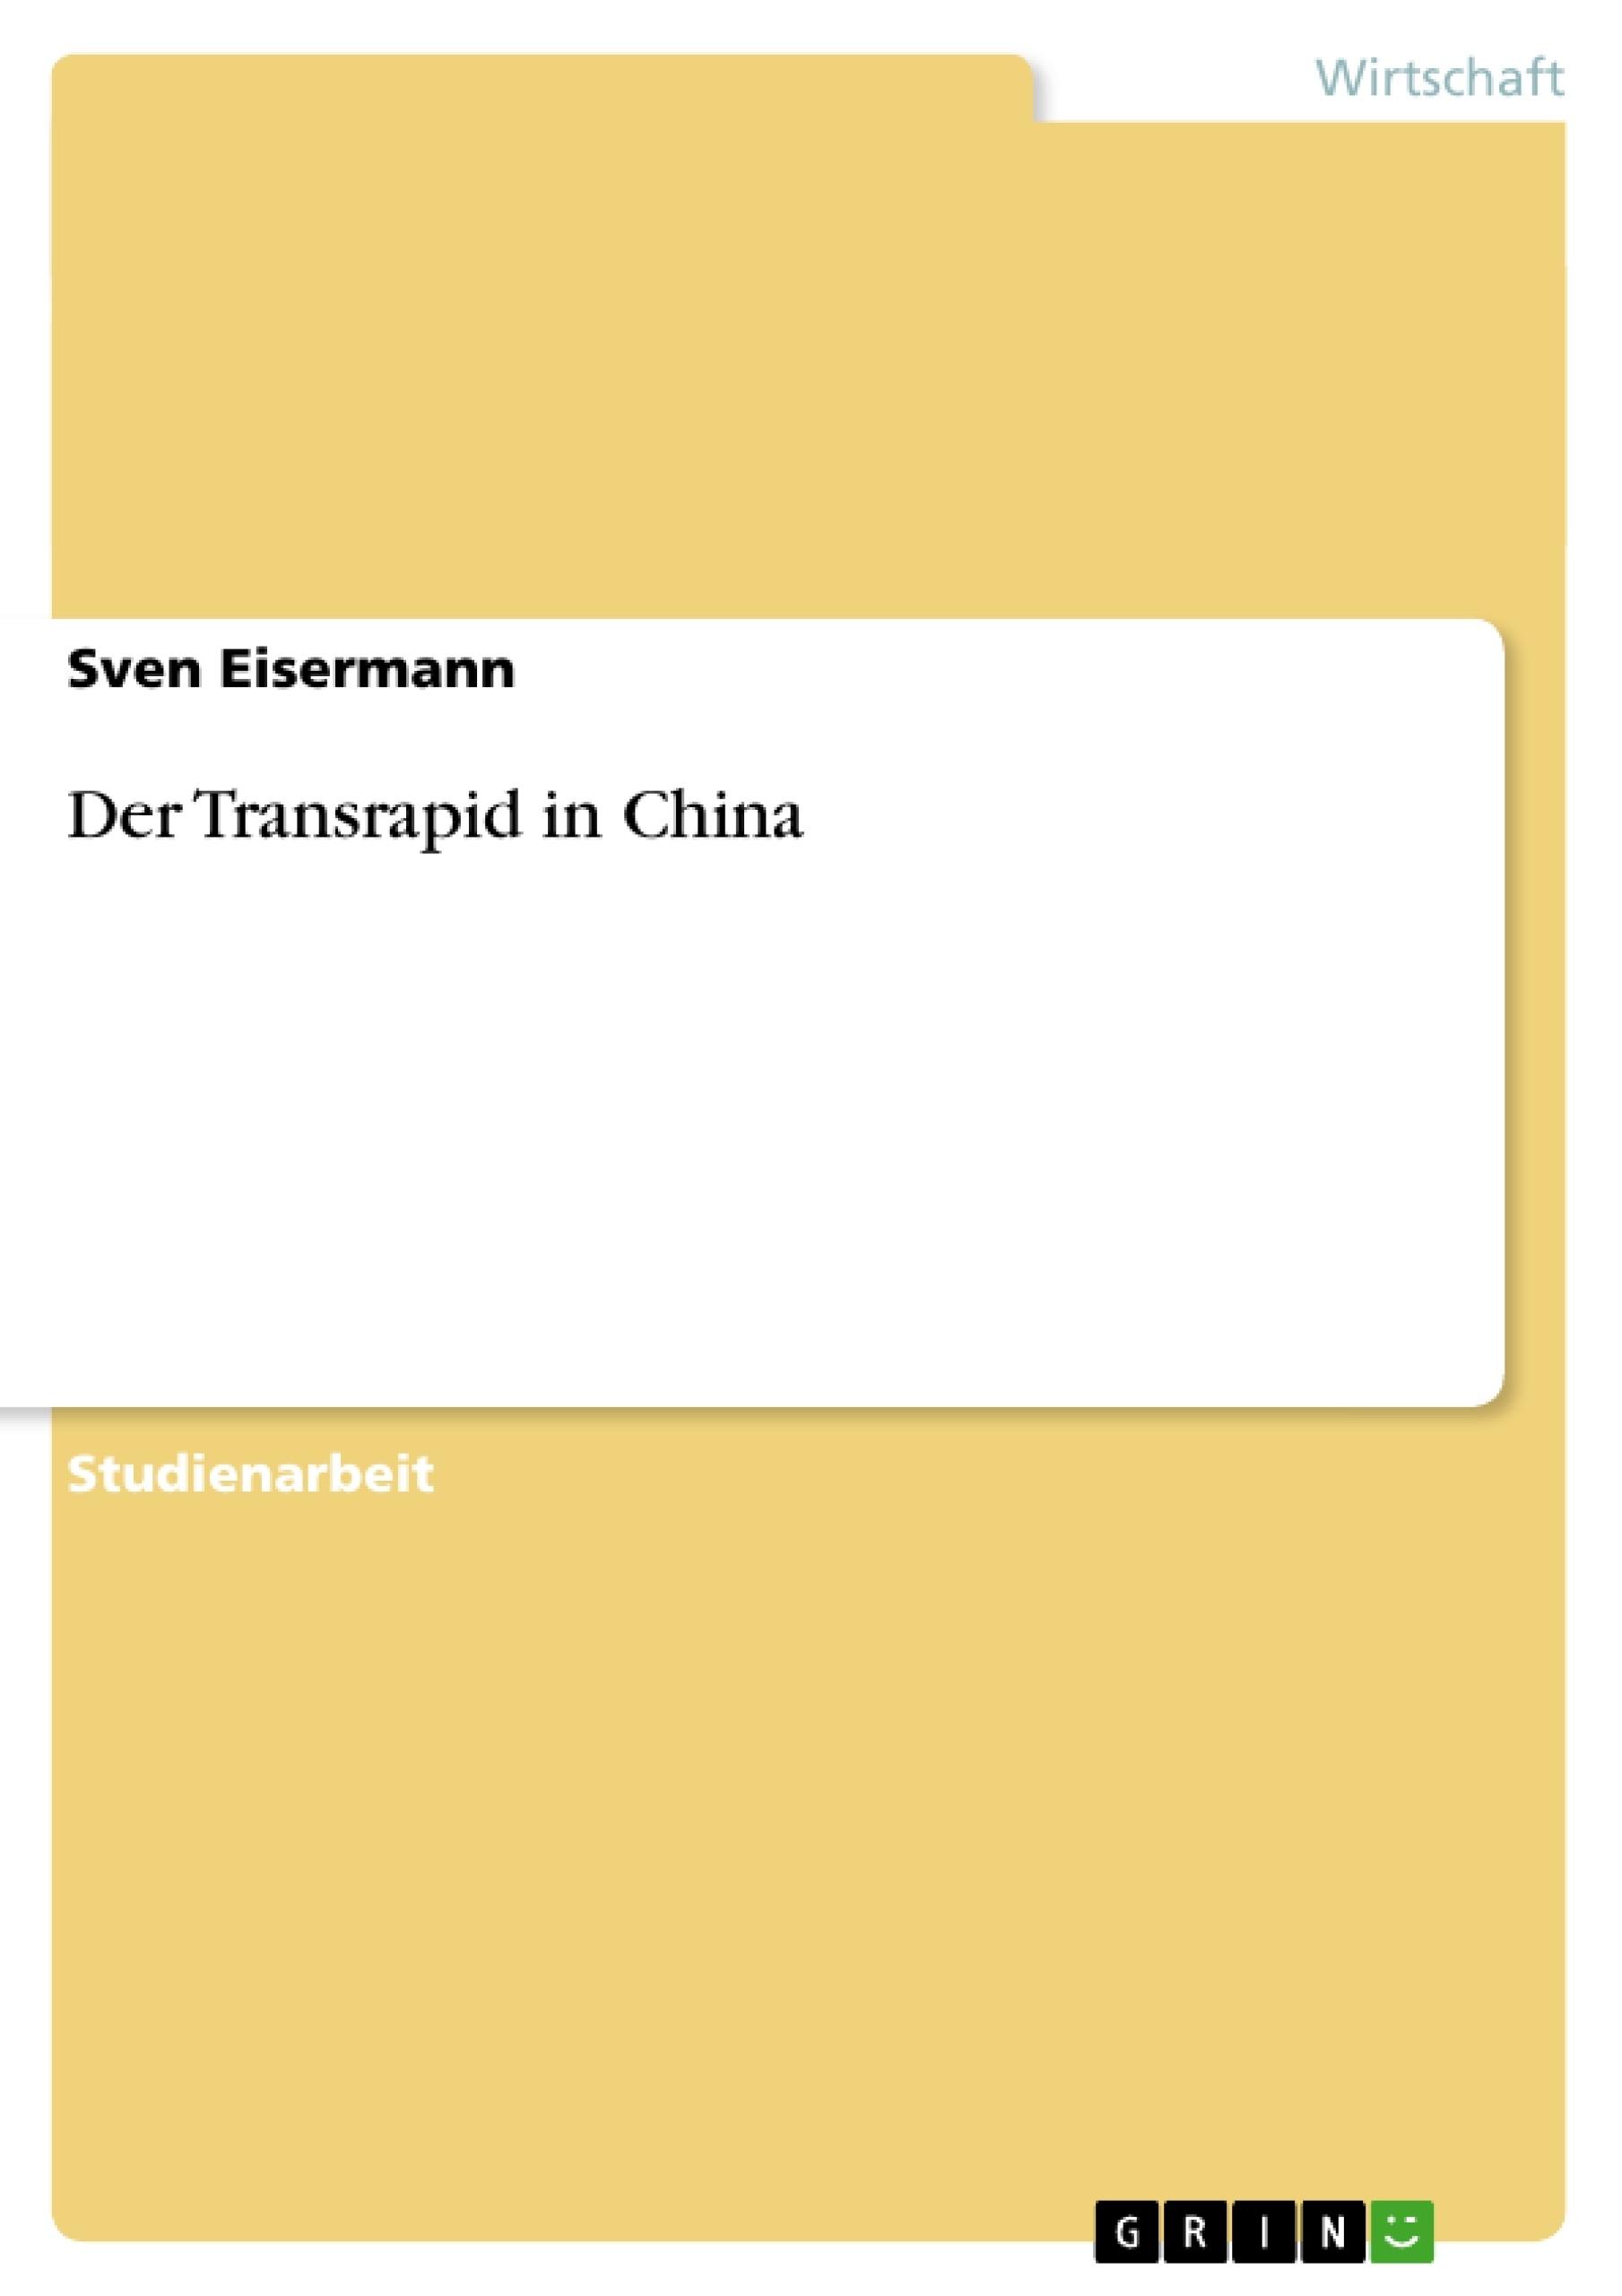 Titel: Der Transrapid in China